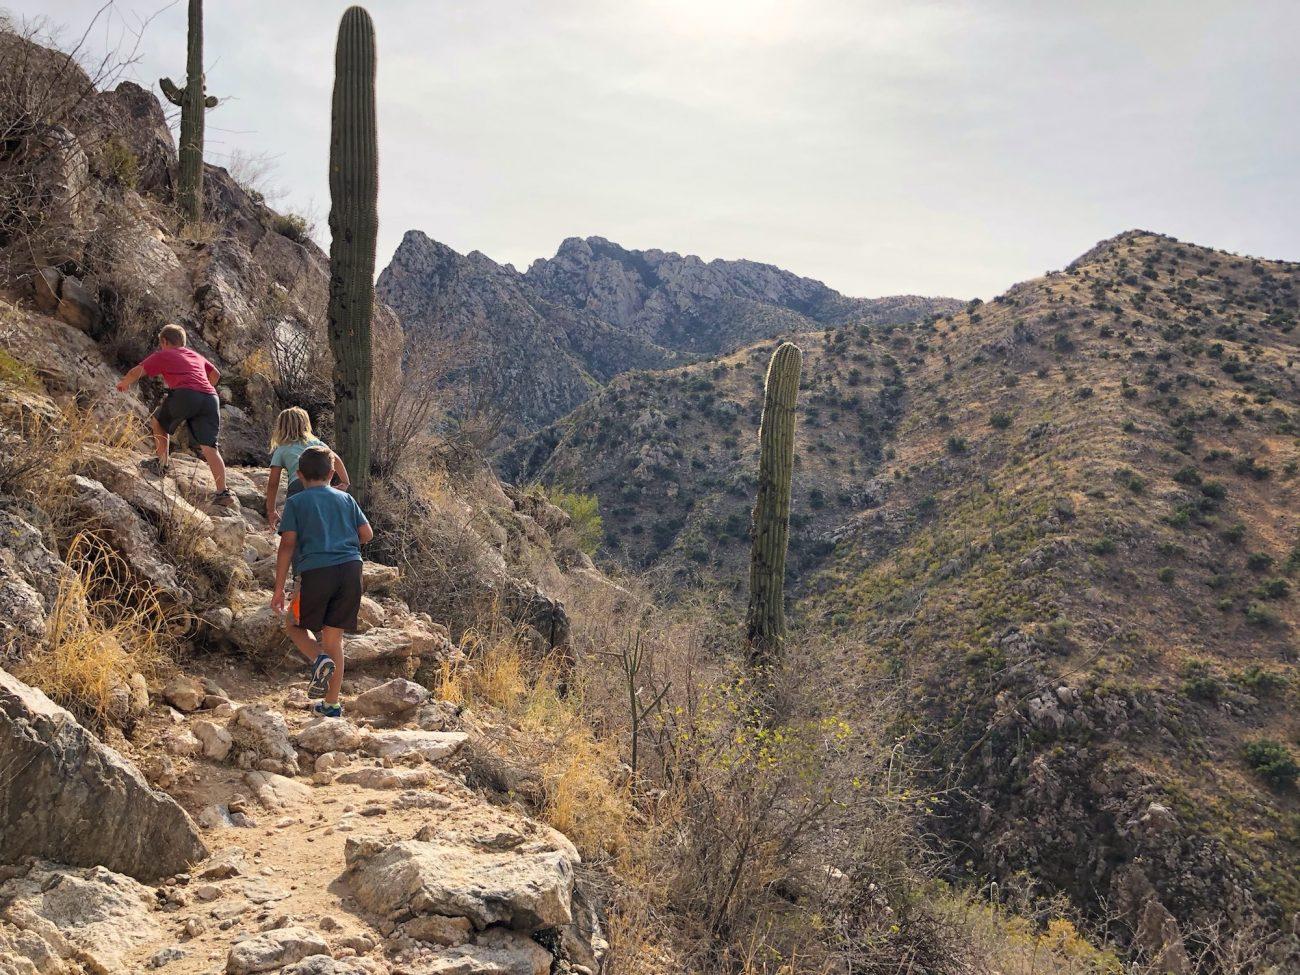 Hiking at Catalina State Park